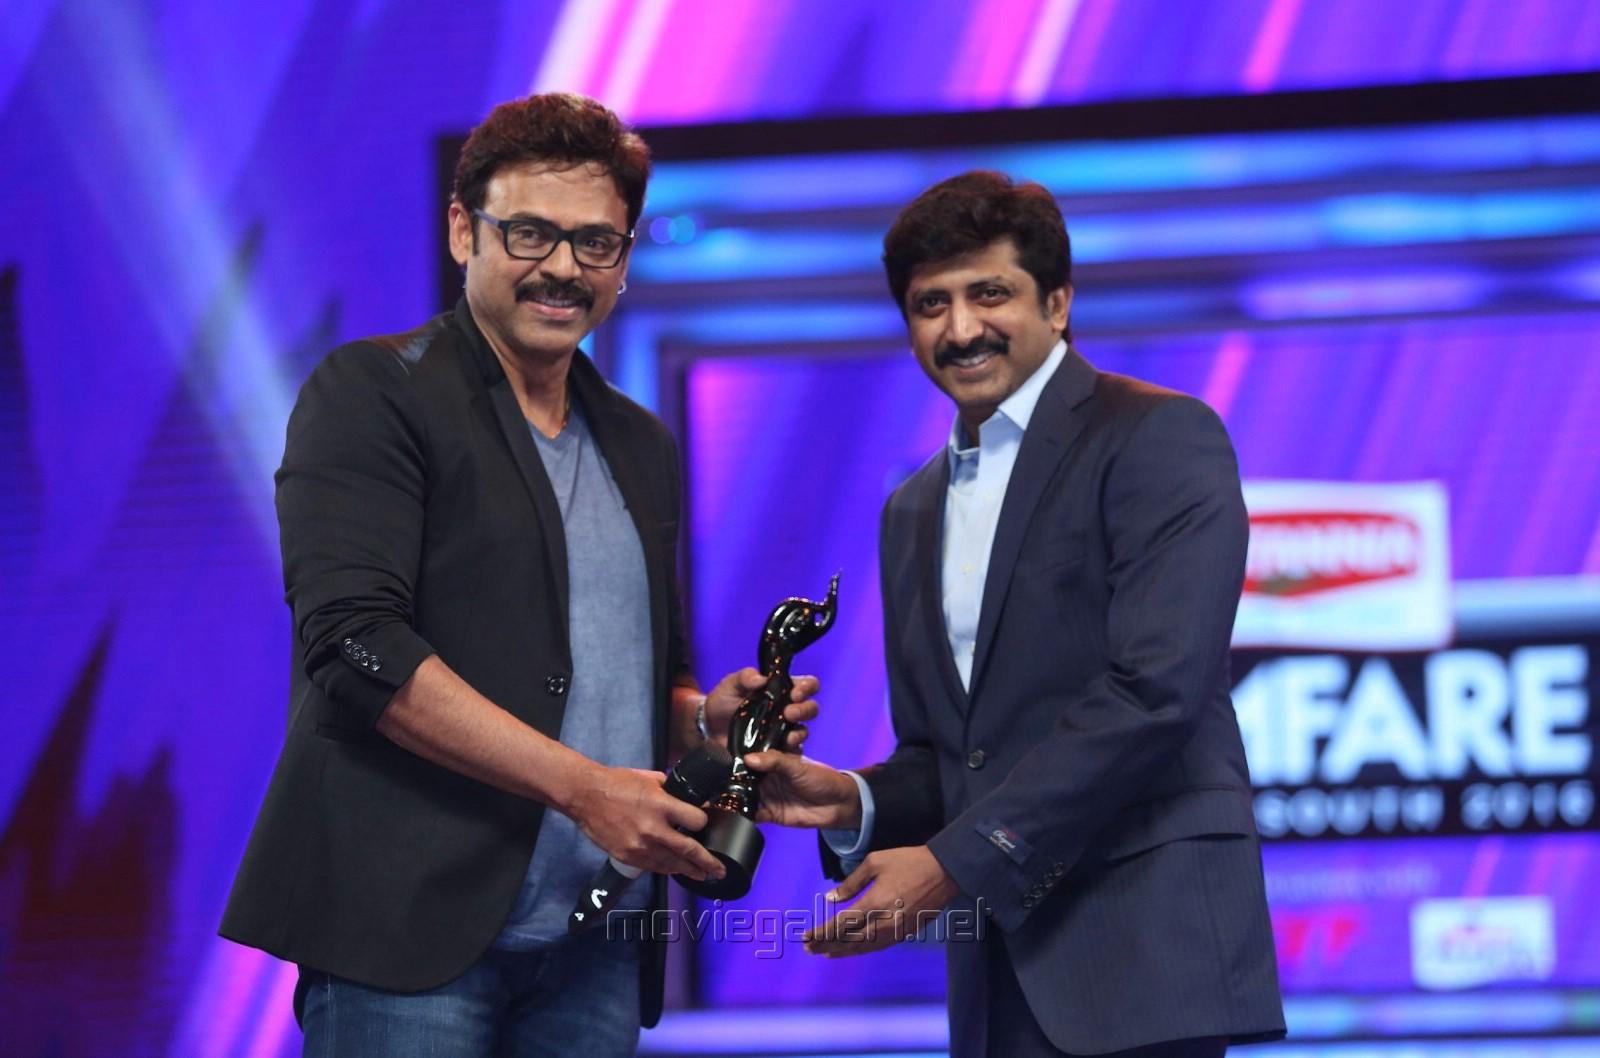 jayam-ravi-got-critics-best-actor-male-award-for-thani-oruvan-63rd-britannia-filmfare-awards-south-function